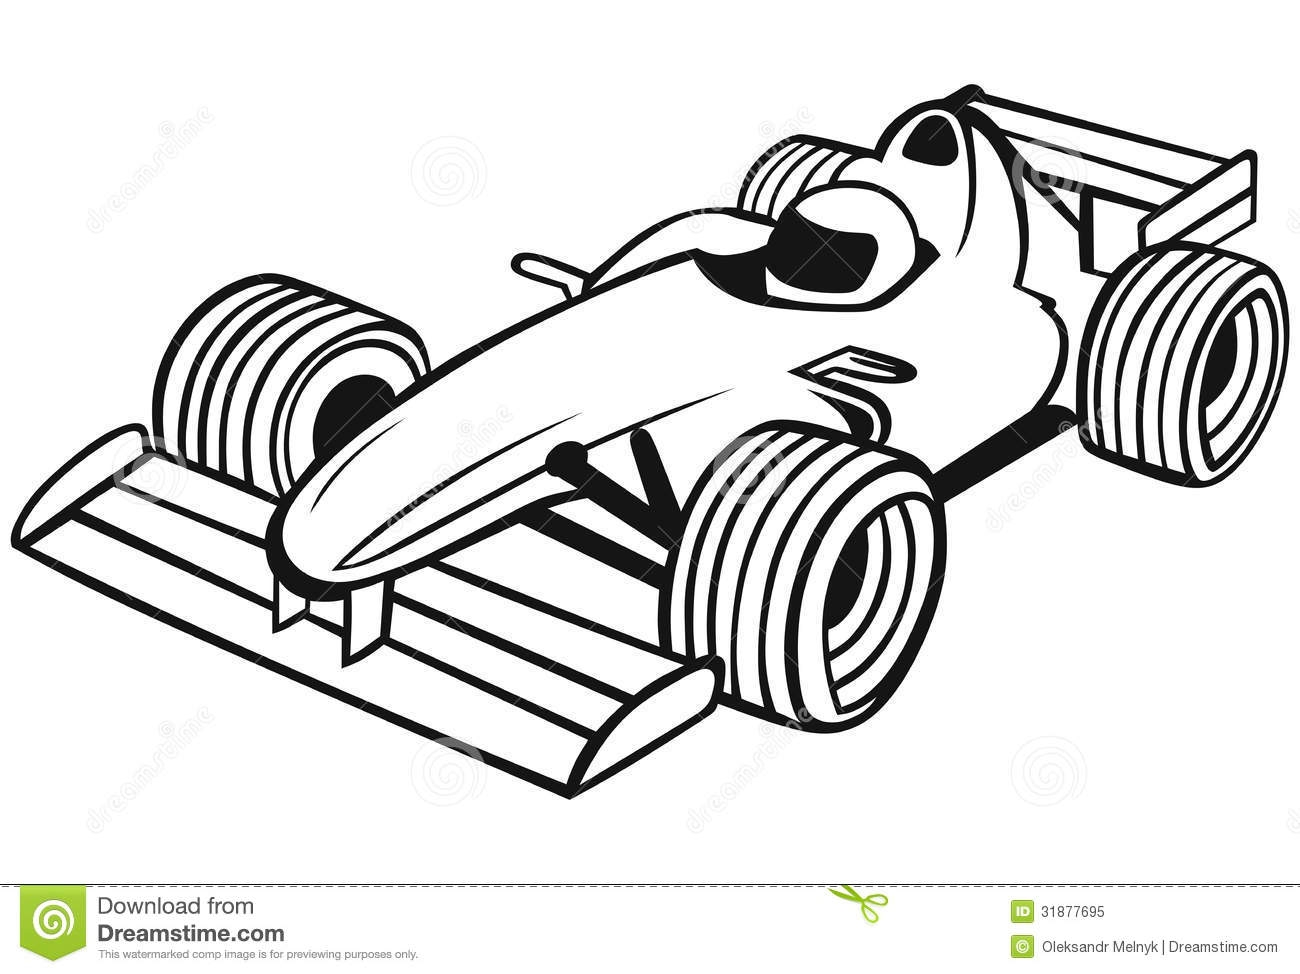 F1 car clipart.